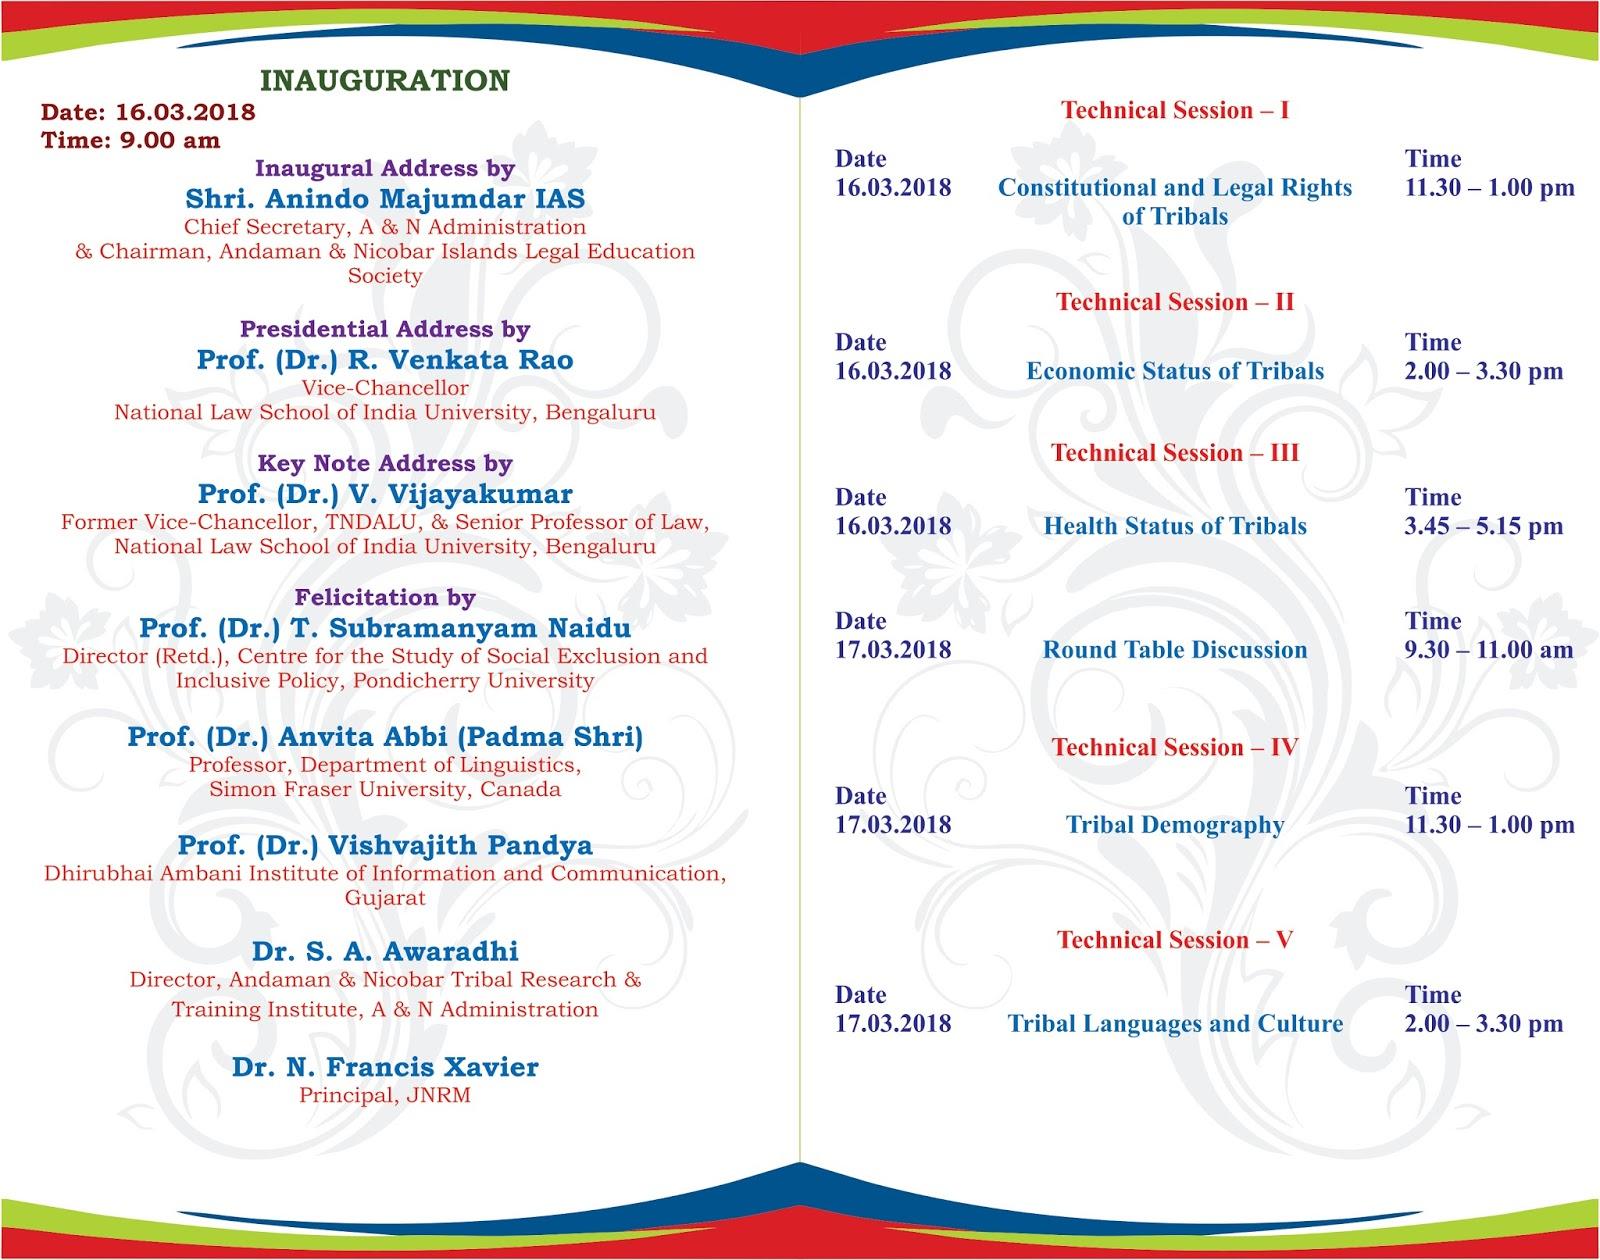 Andaman Law College INVITATION FOR NATIONAL SEMINAR AT ANDAMAN LAW